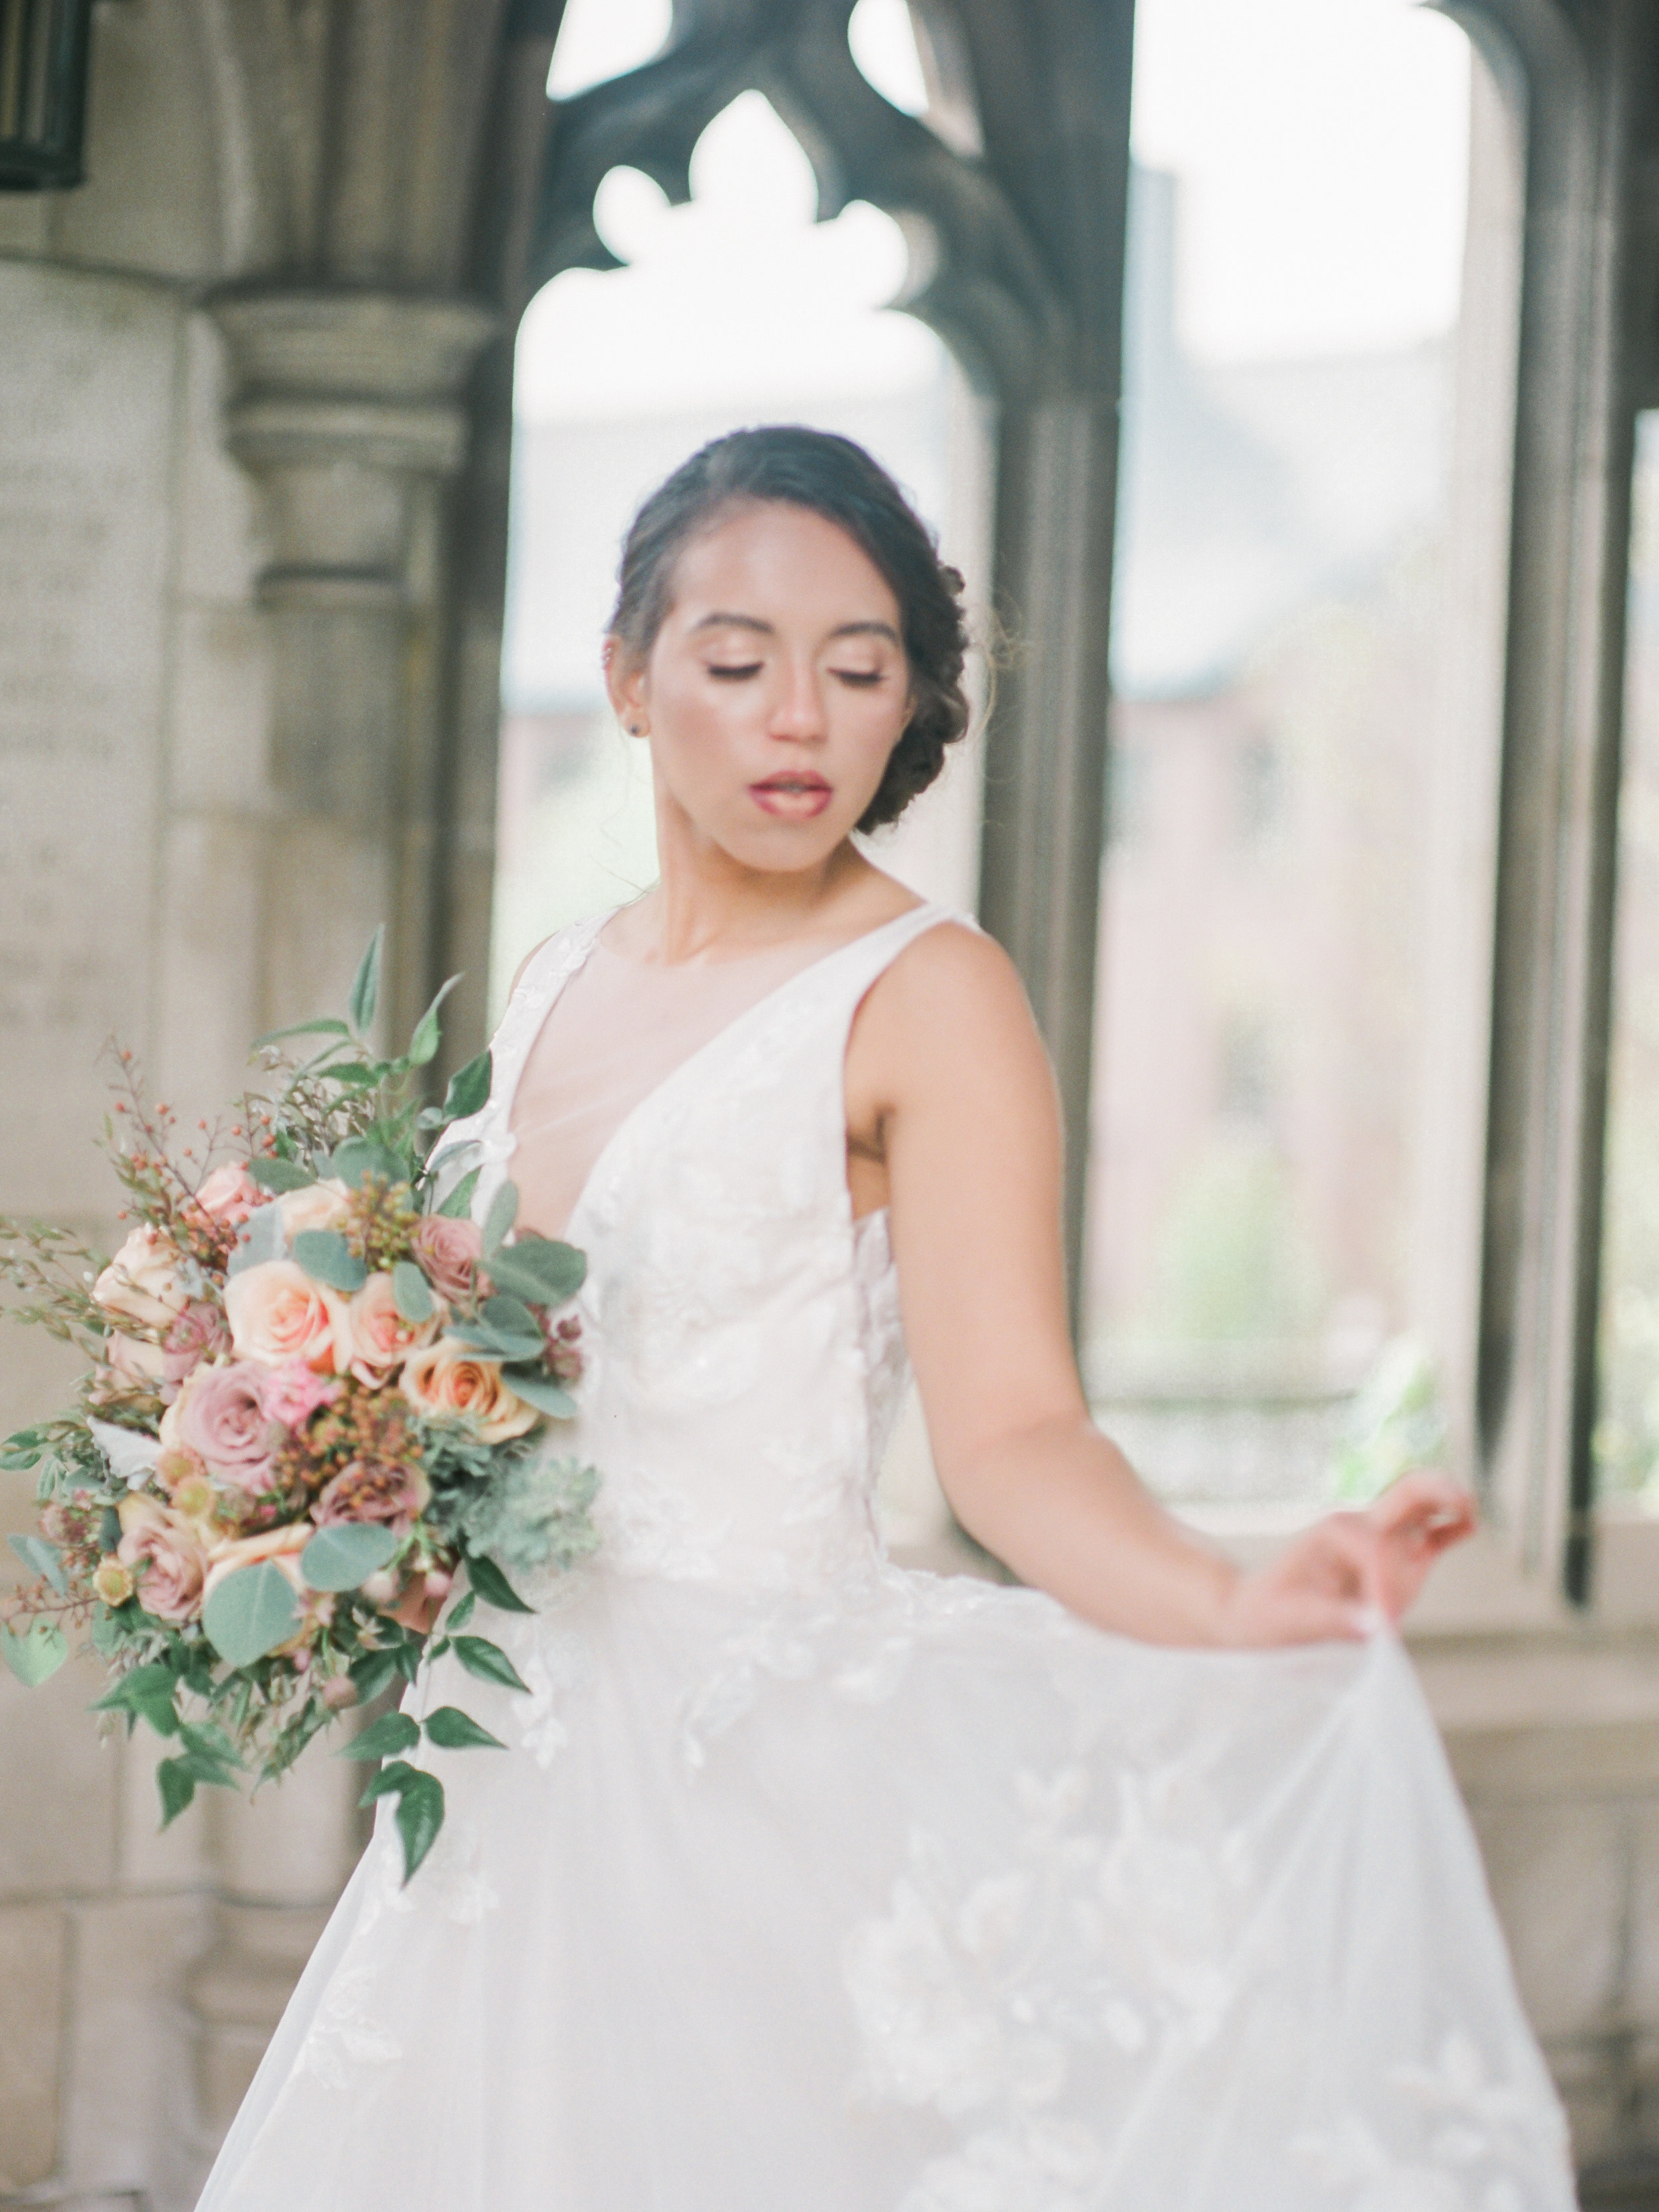 Ithaca New York-Brides Story-Manda Weaver-Wedding-23.jpg